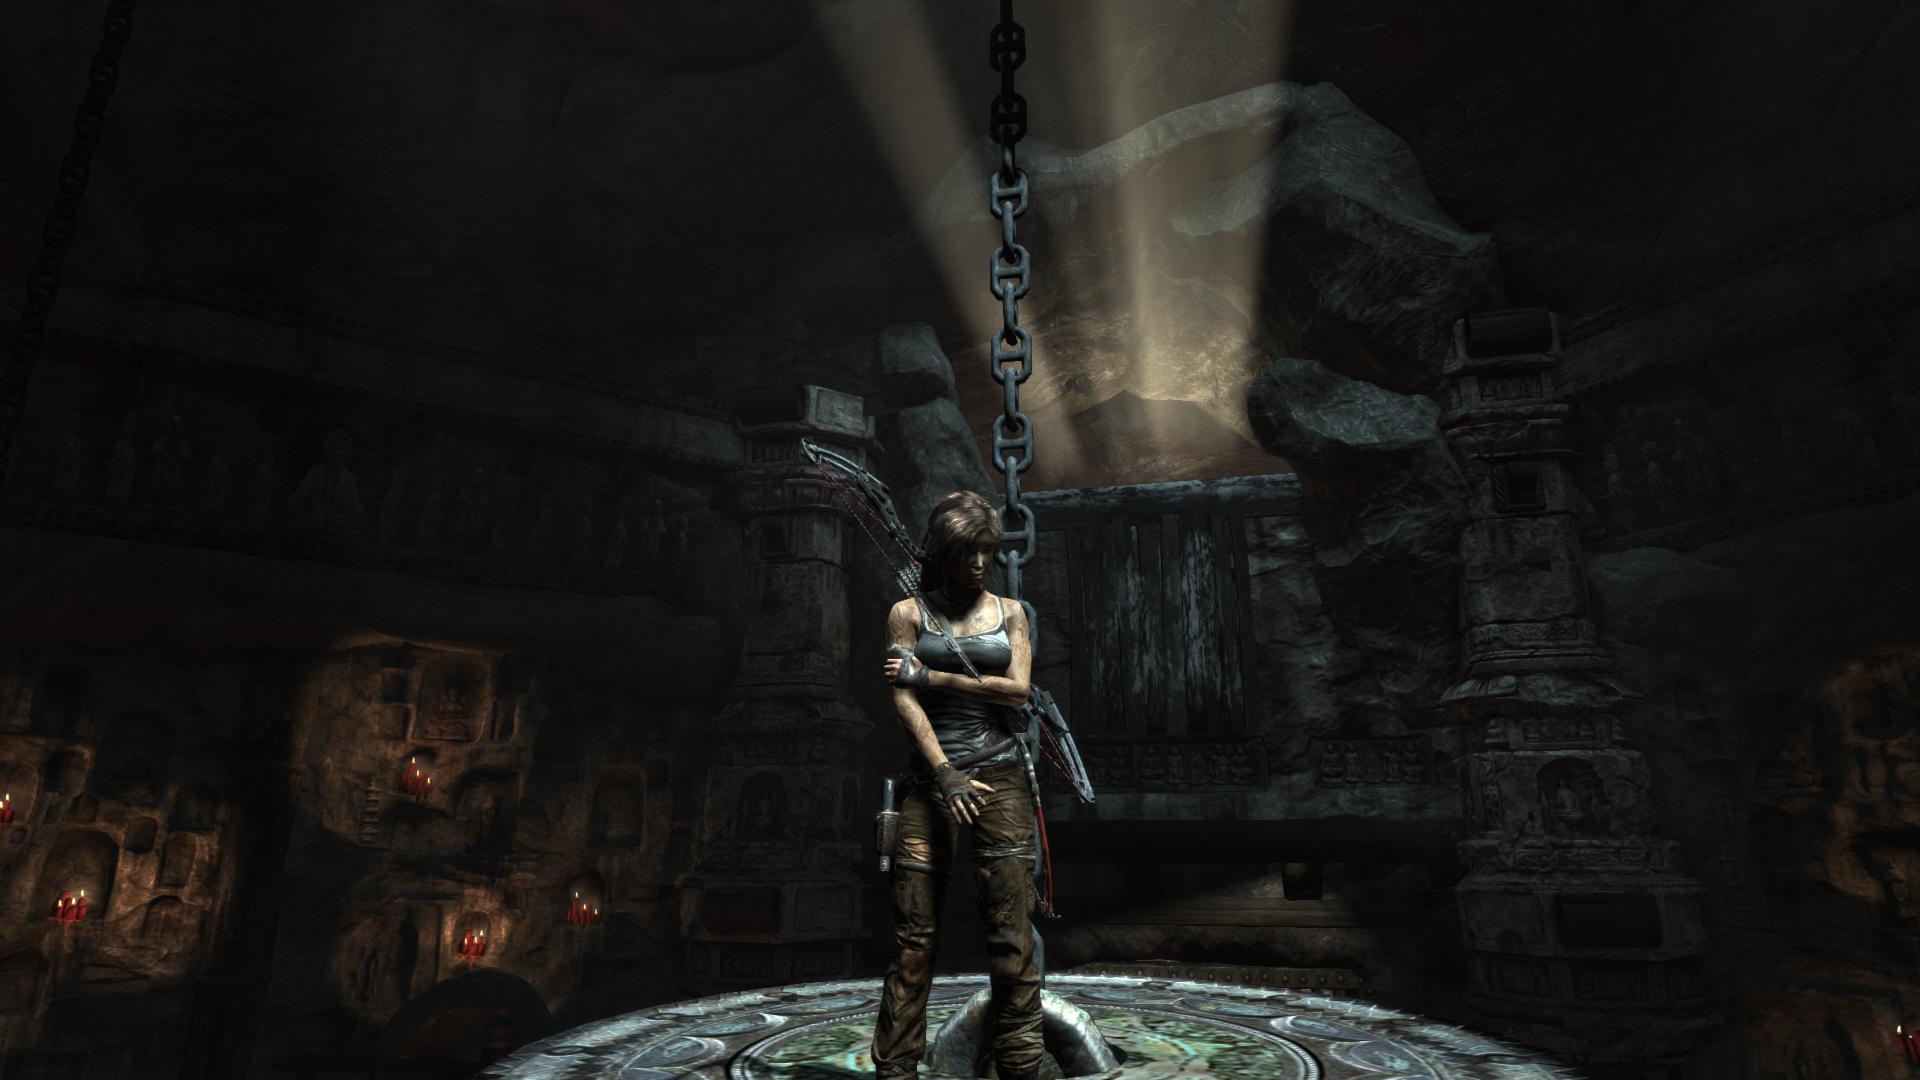 Wallpapers Fond Decran Pour Tomb Raider PC Wii GB PS1